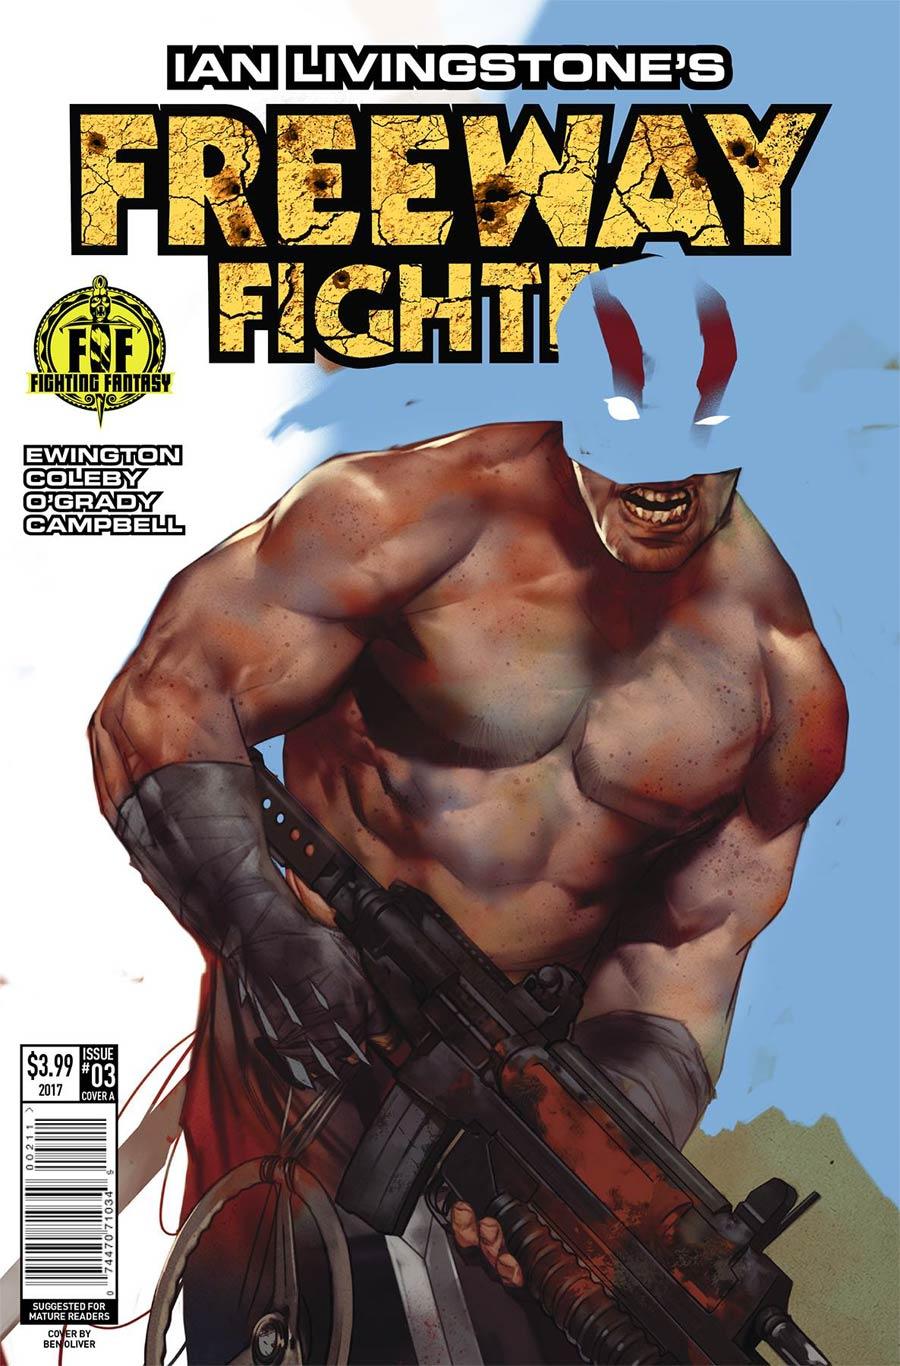 Ian Livingstones Freeway Fighter #3 Cover A Regular Ben Oliver Cover